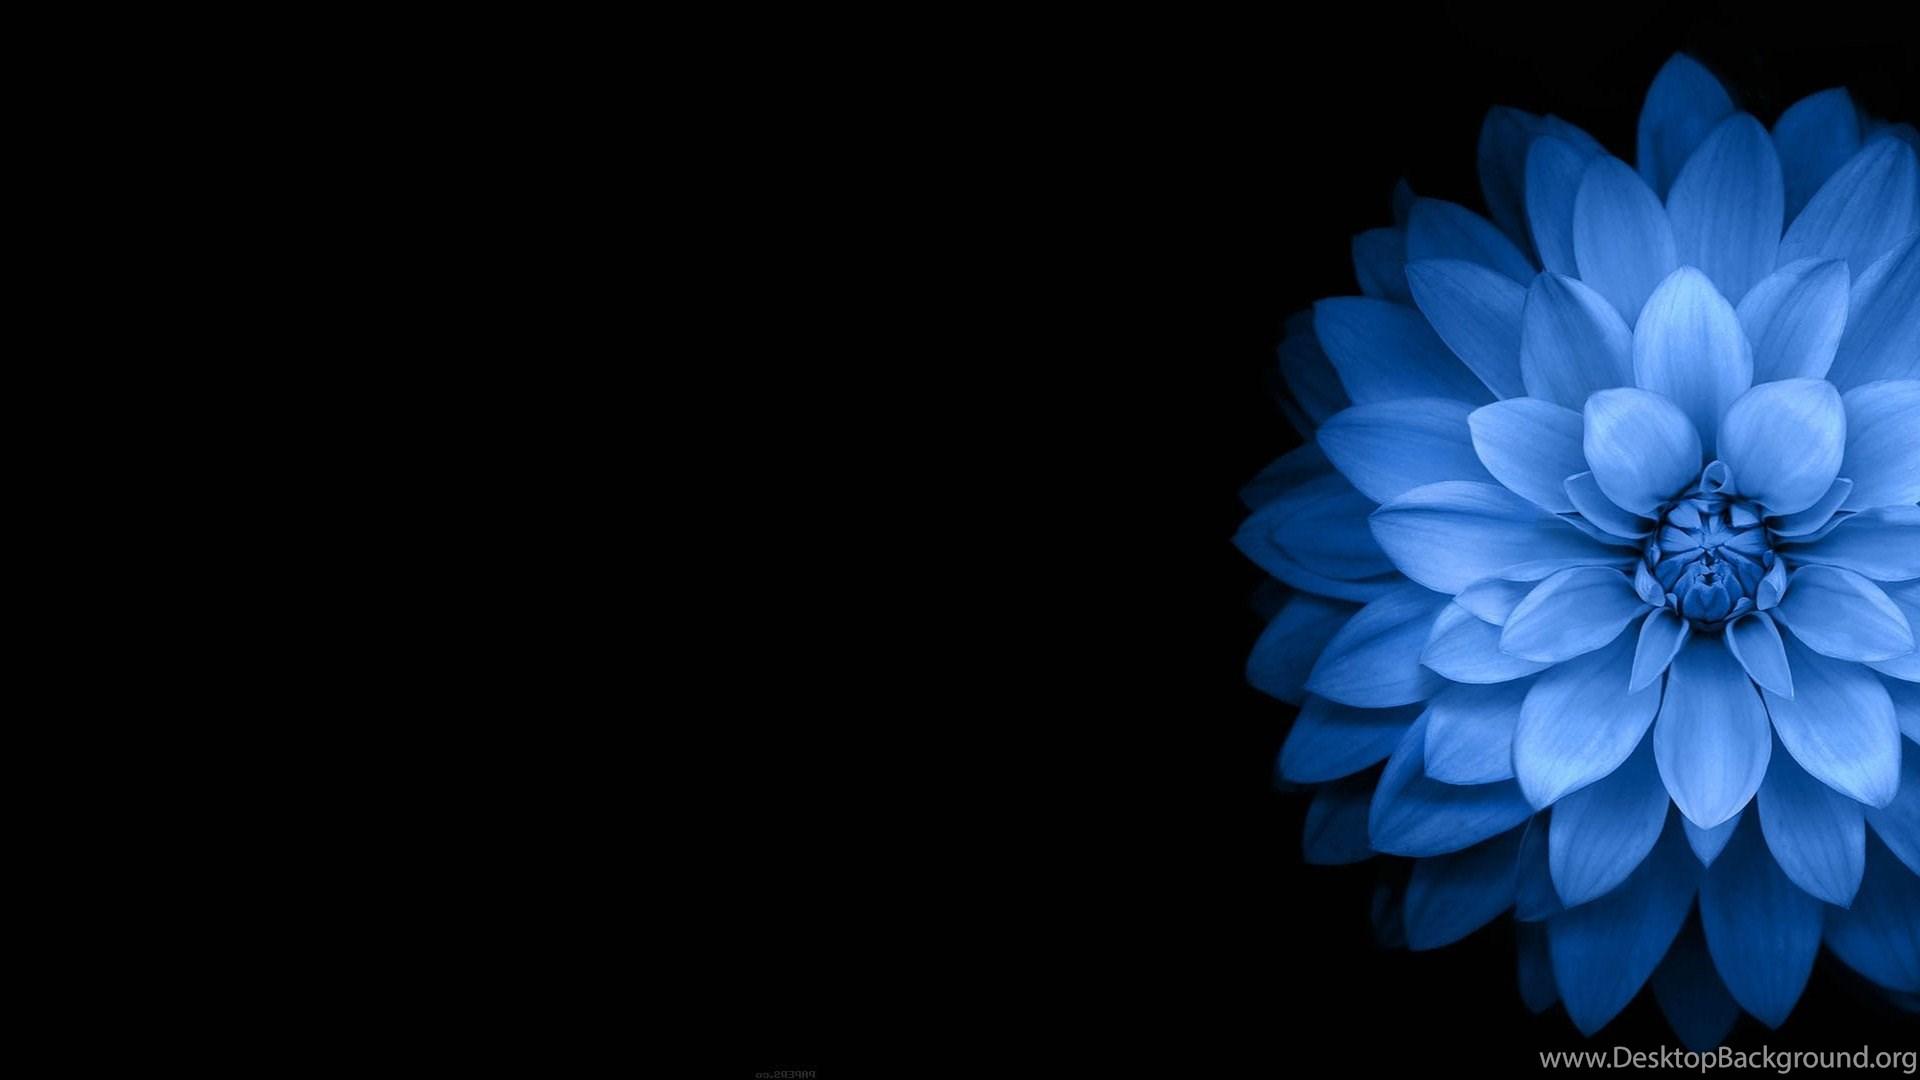 Flowers Blue Black Dark Wallpapers Hd Desktop And Mobile